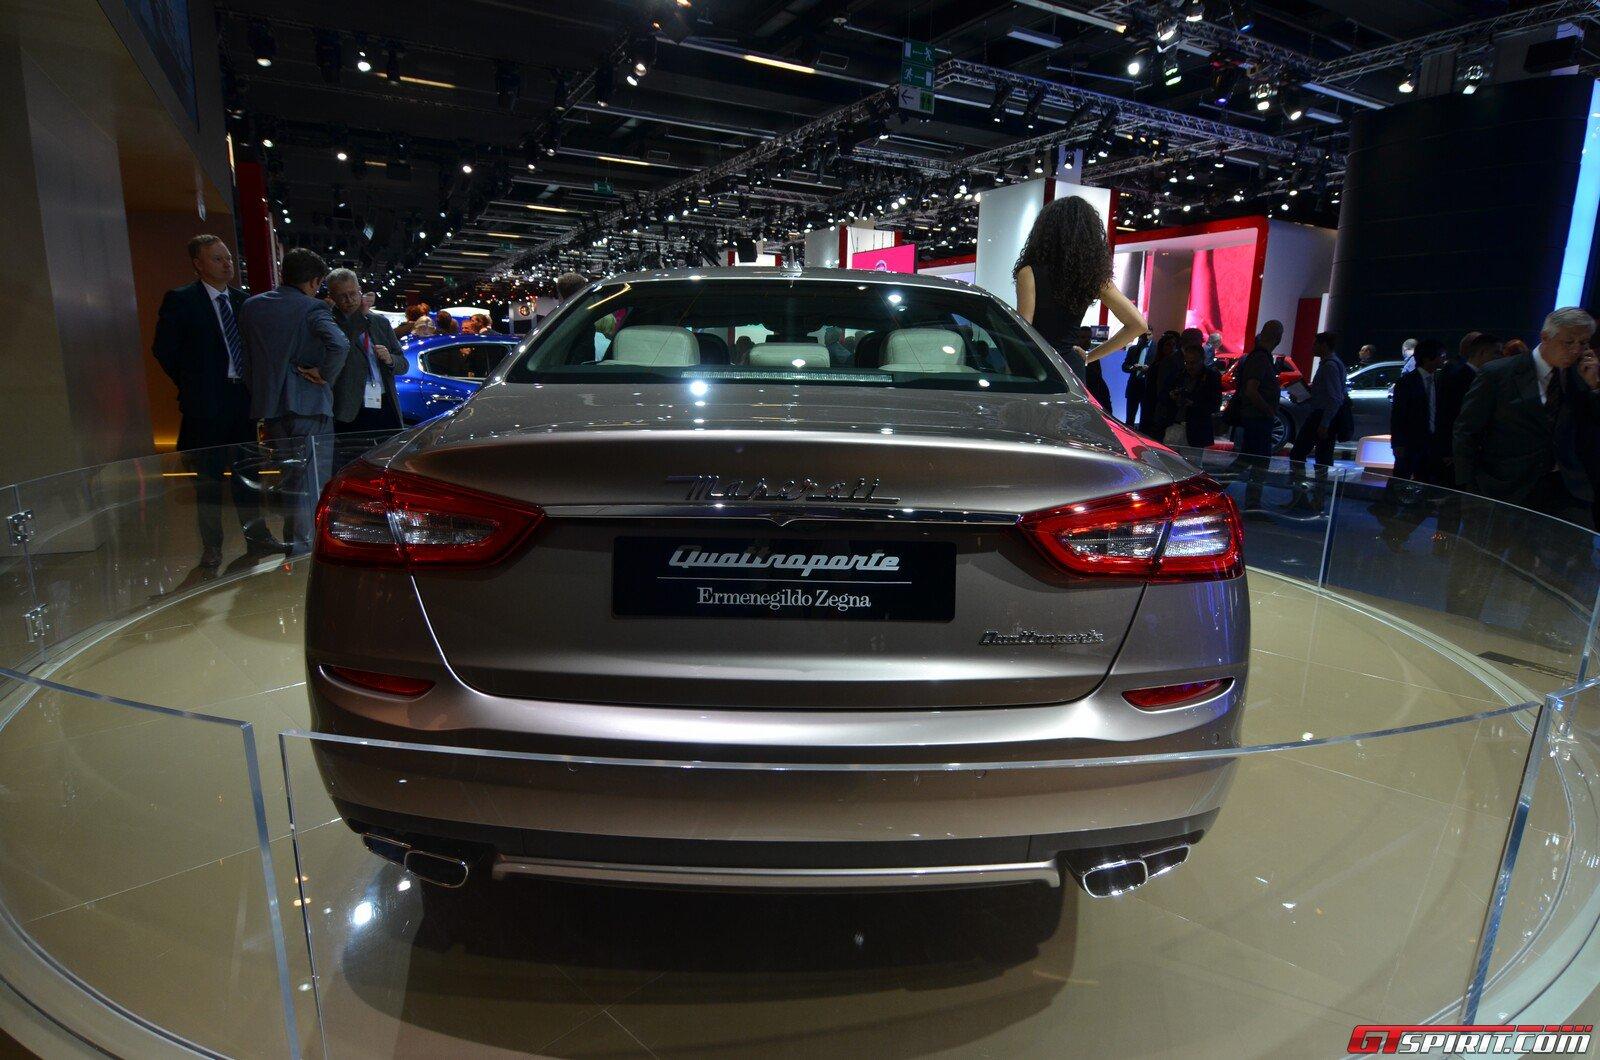 https://storage.googleapis.com/gtspirit/uploads/2013/09/Maserati-Quattroporte-Ermenegildo-Zegna-Limited-Edition-at-Frankfurt-Rear.jpg